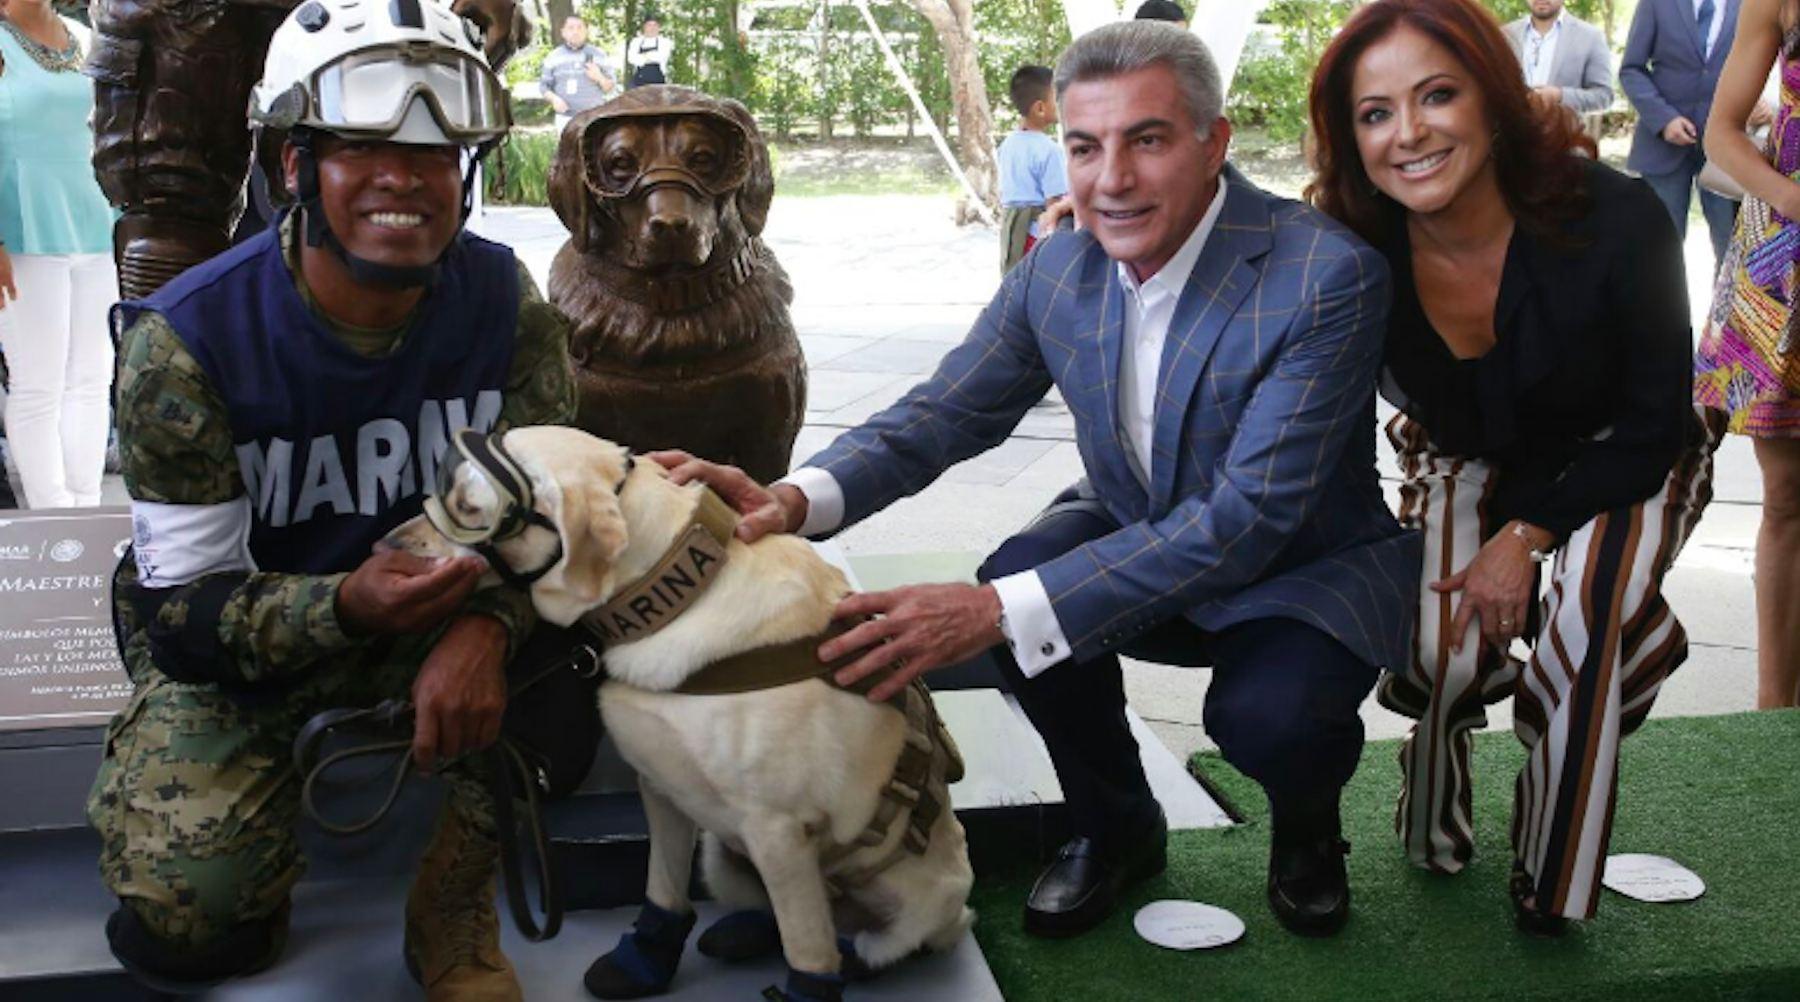 frida_dog_statue_mexico-1532106287258-1532106289351.jpg